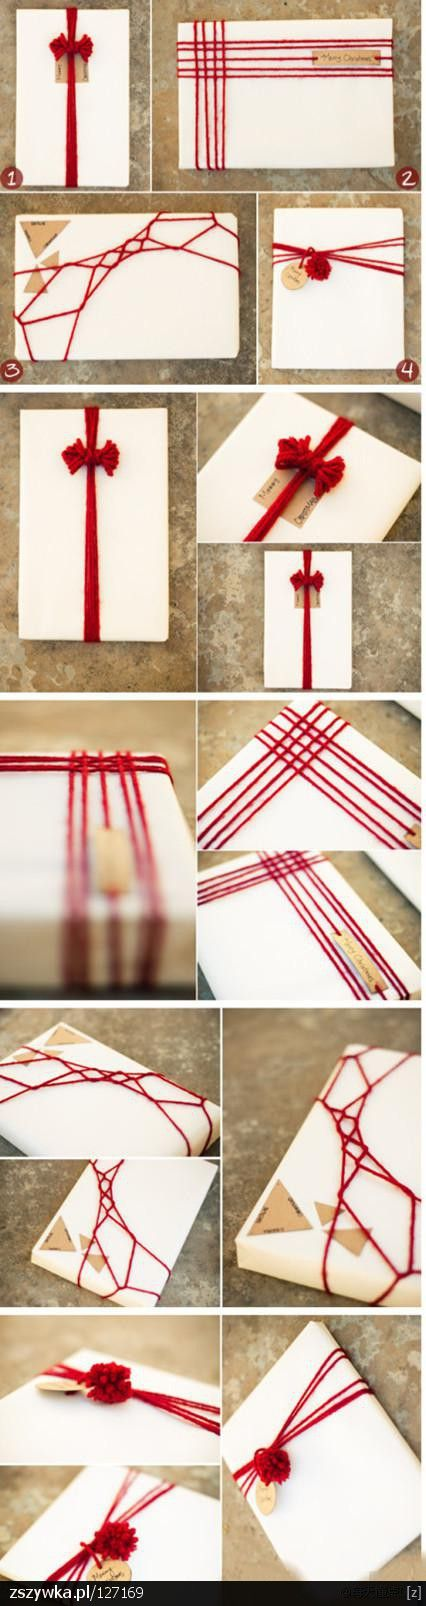 Alternative Christmas Present Wrapping ideas